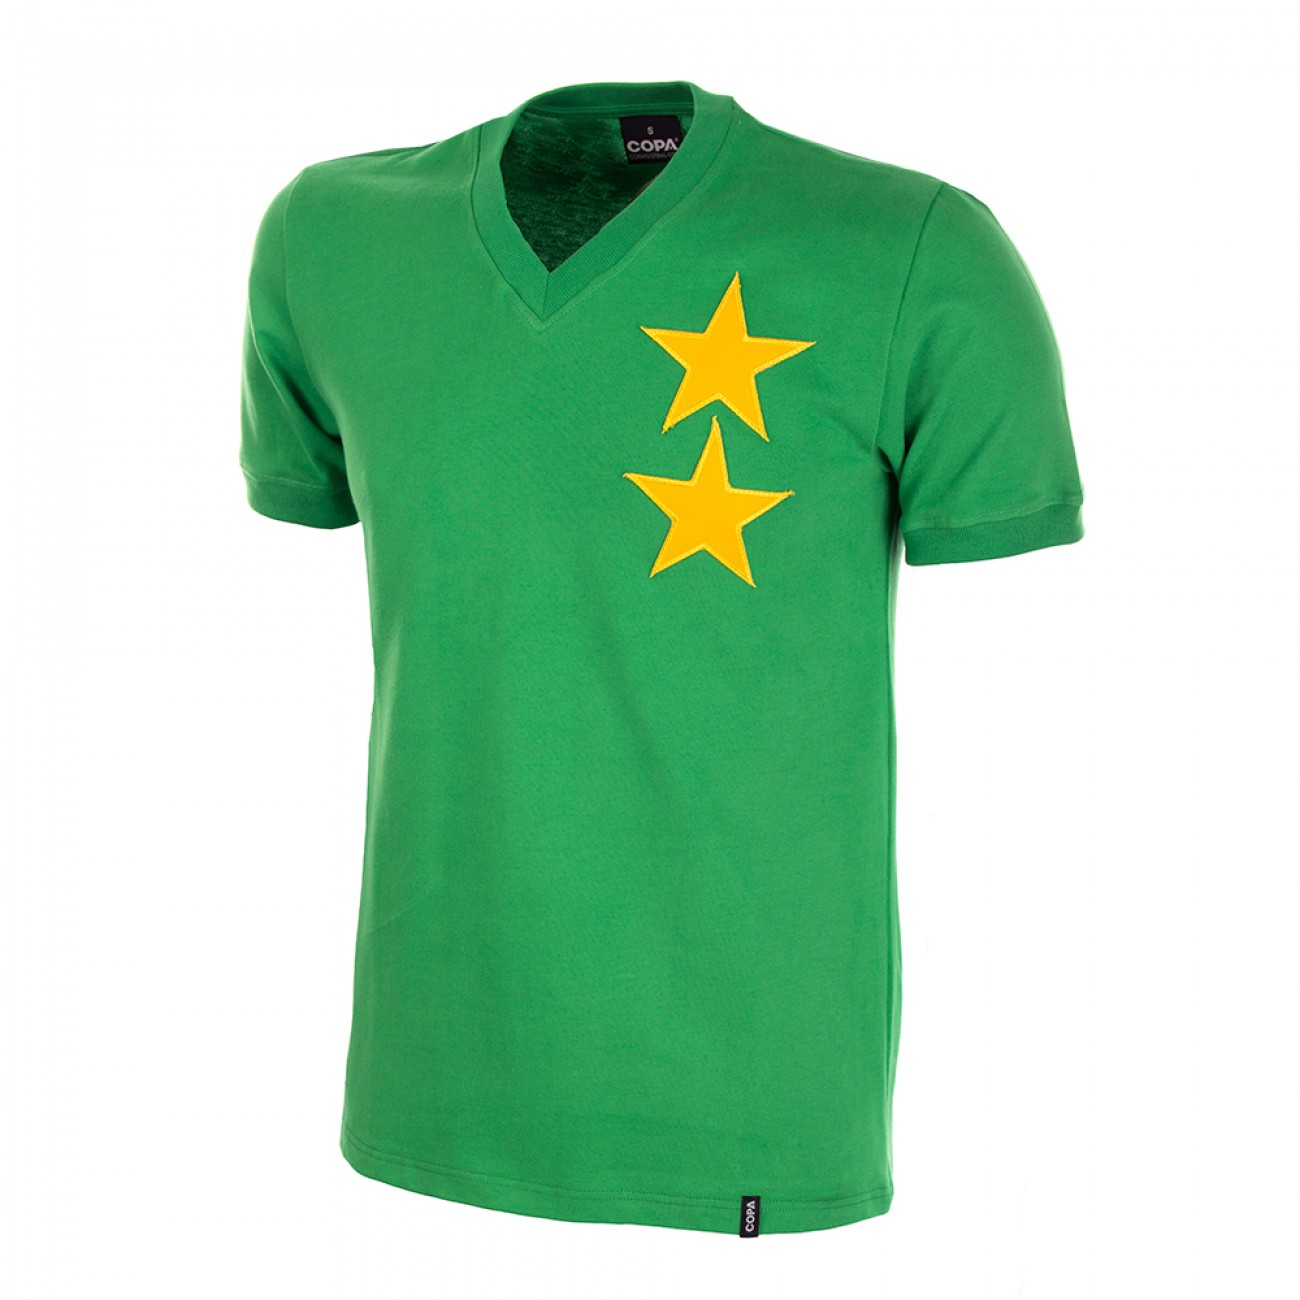 http://www.retrofootball.es/ropa-de-futbol/camiseta-camerun-a-os-70.html